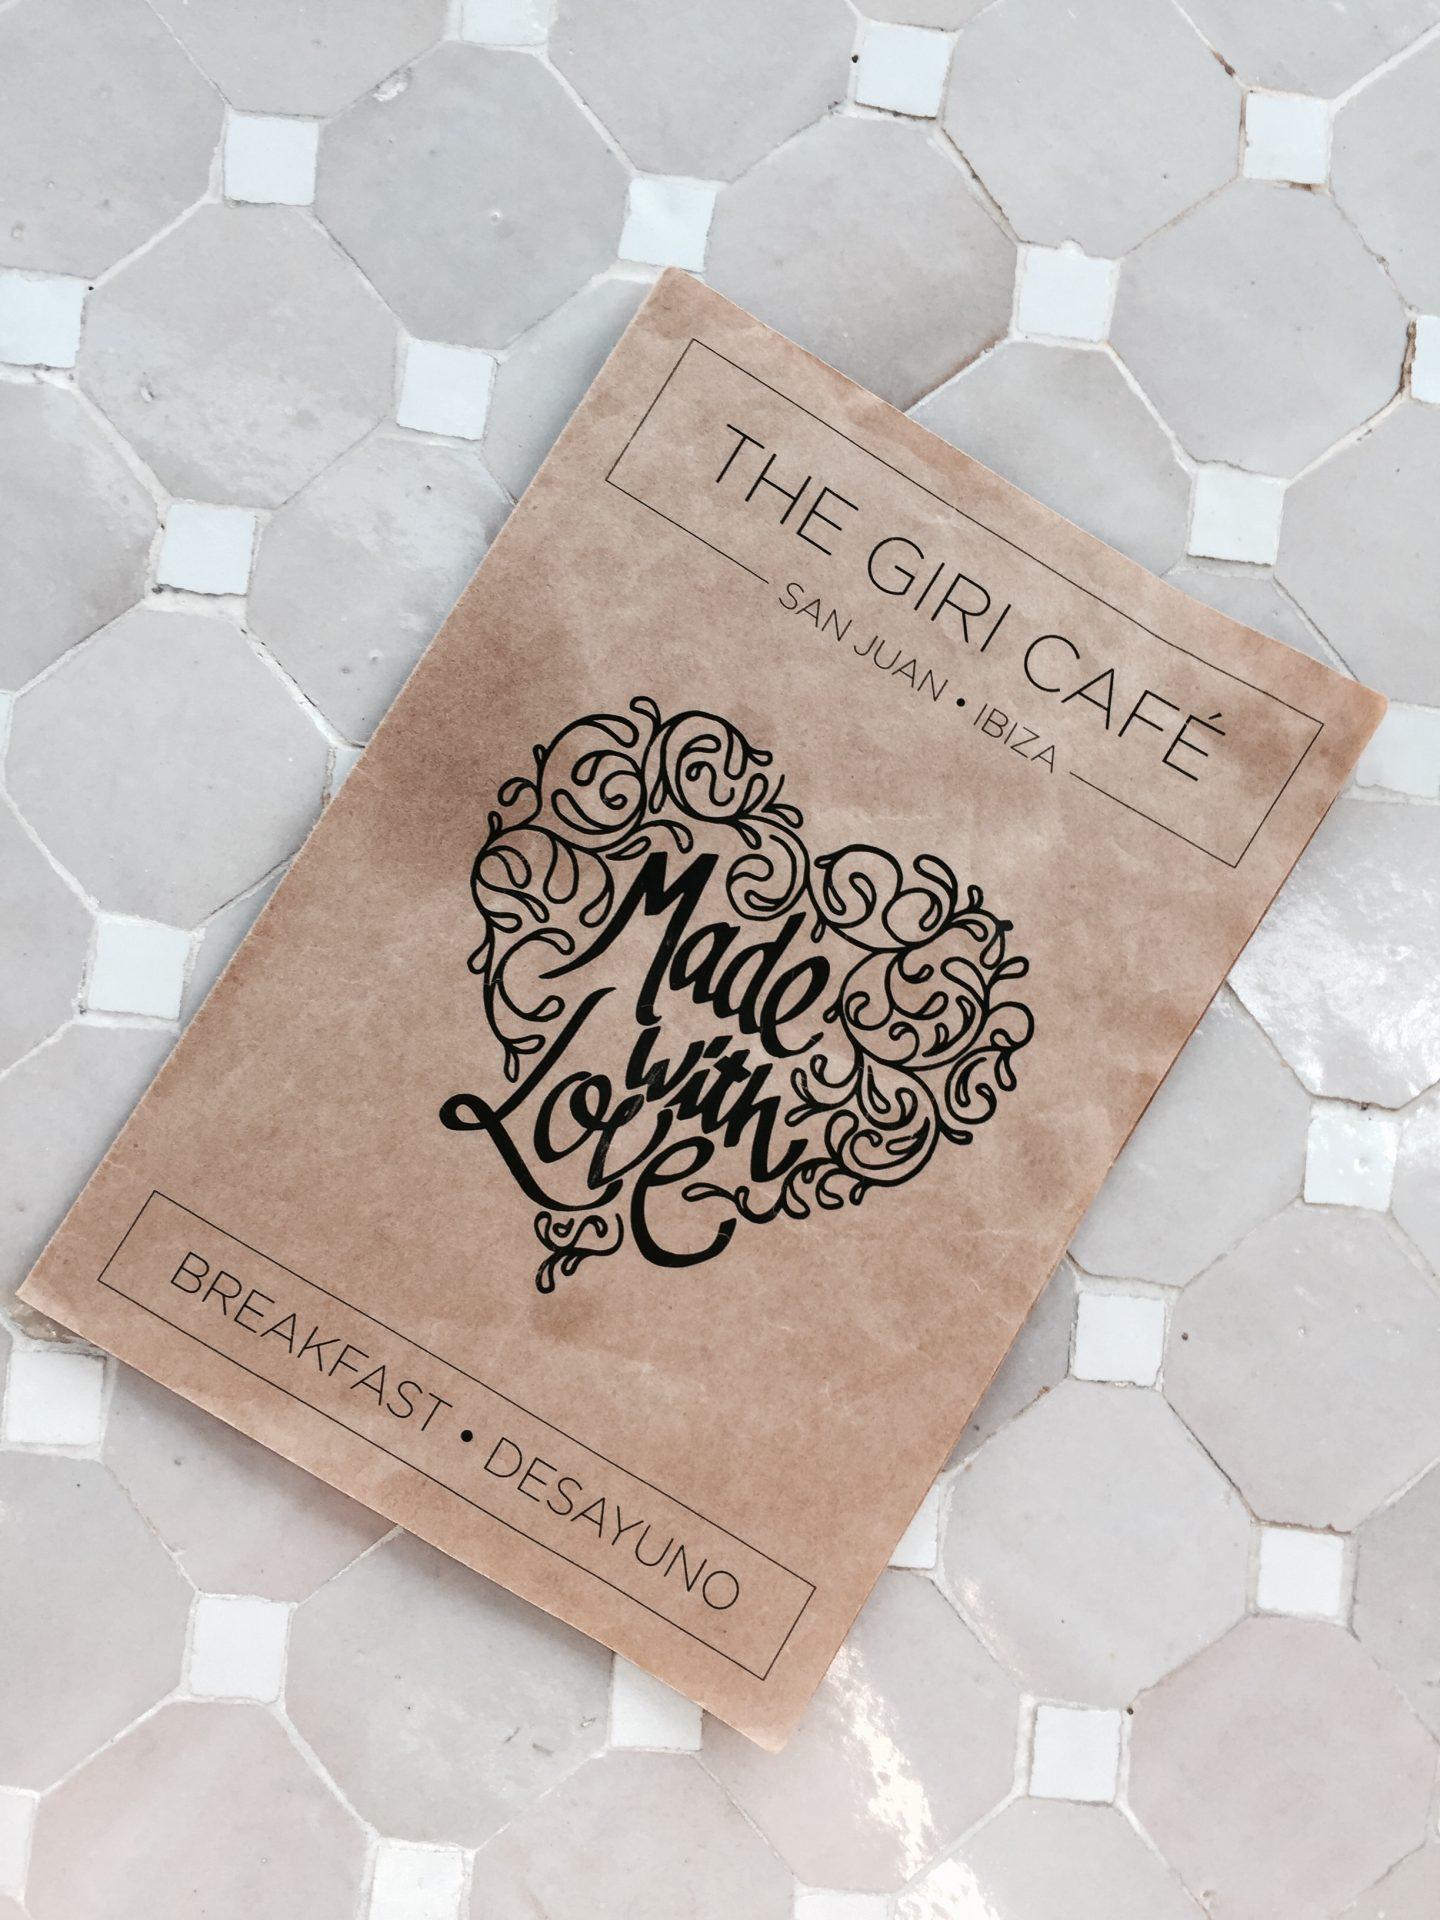 THE GIRI CAFE – best breakfast in Ibiza